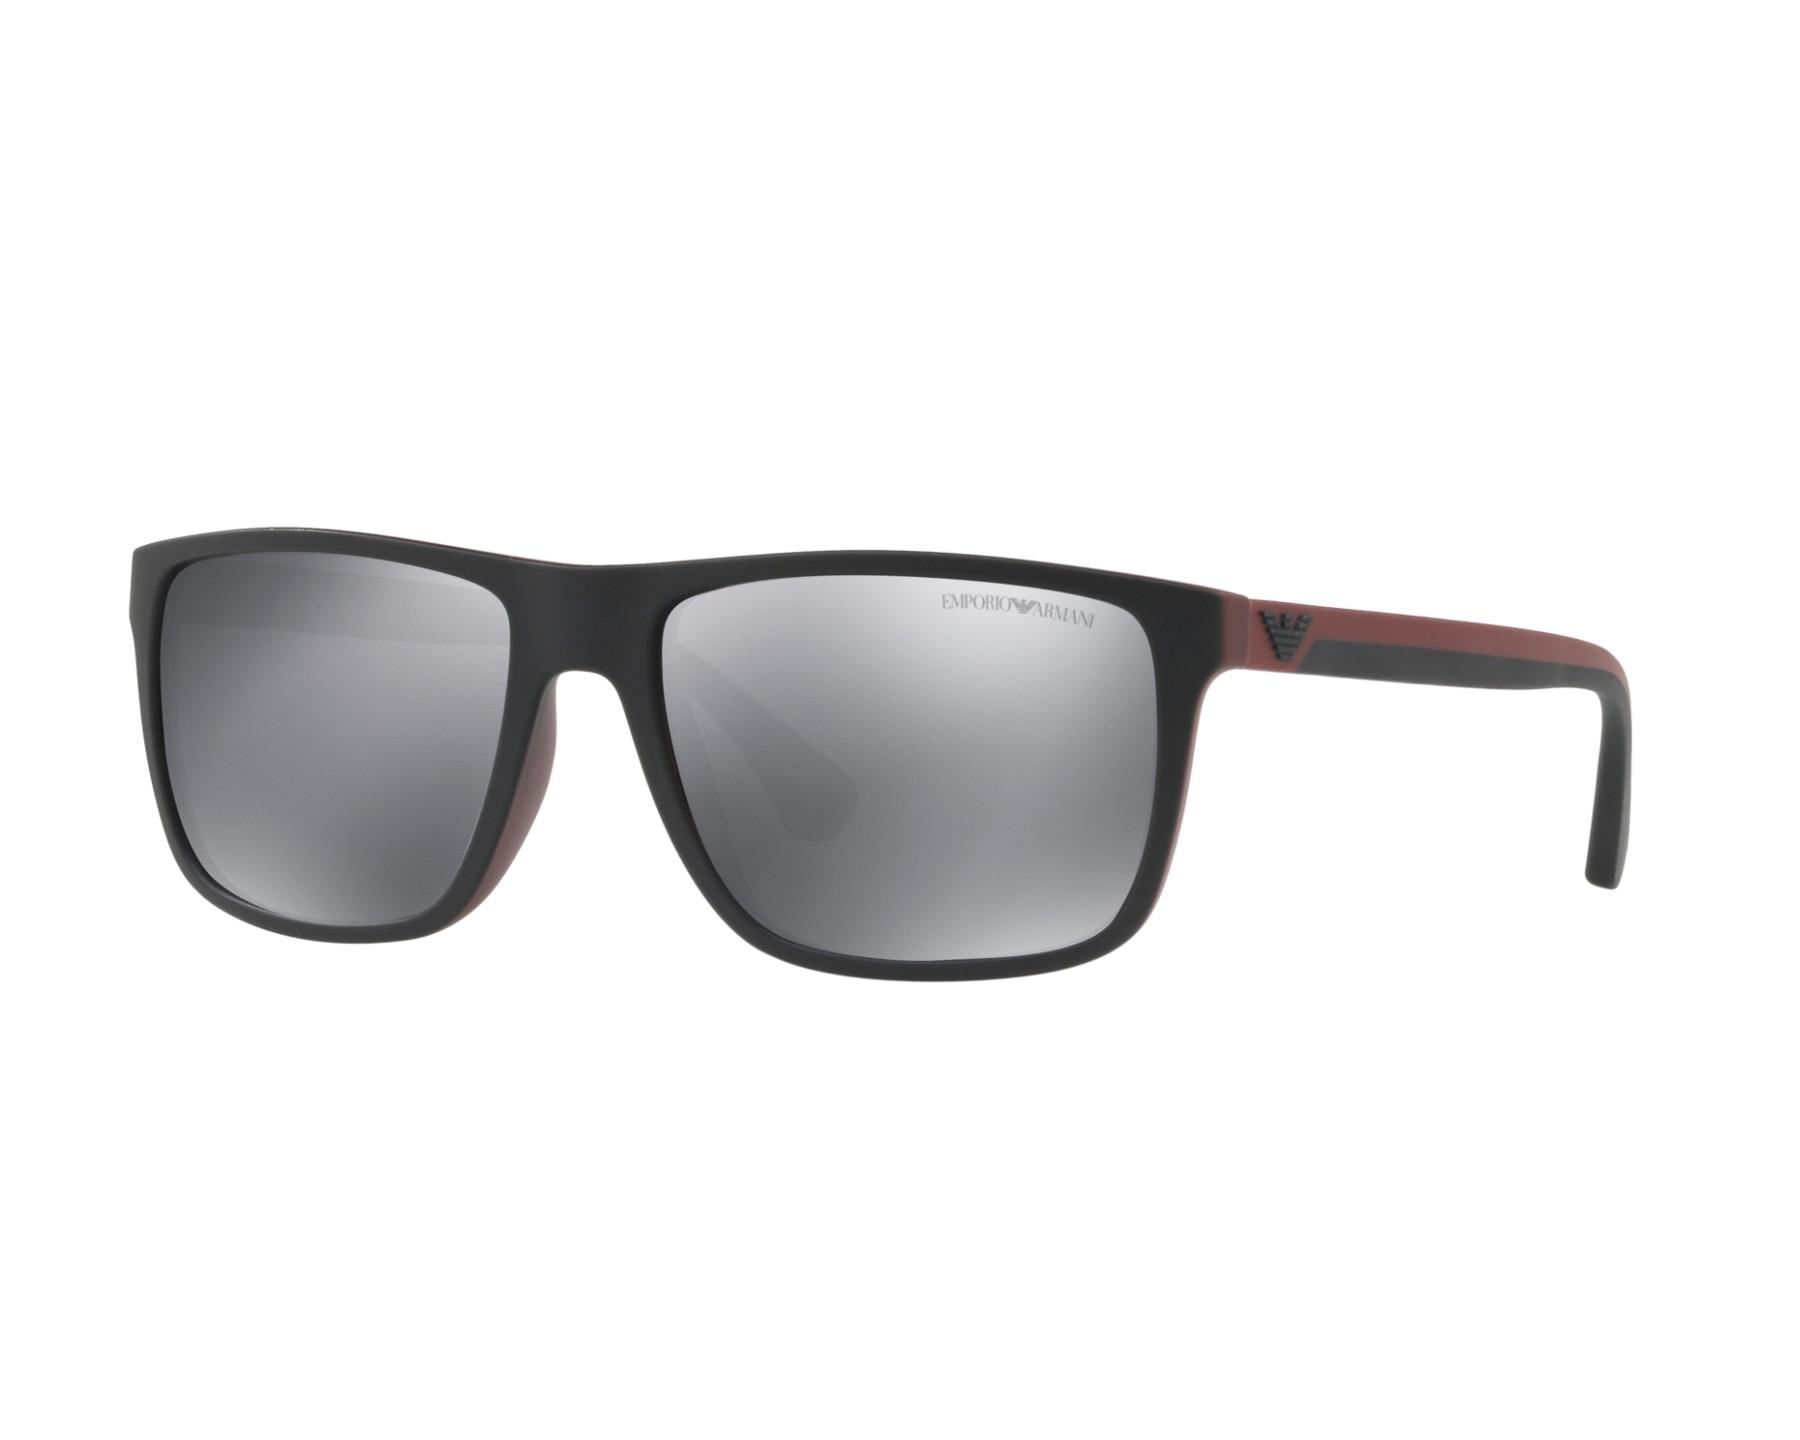 a876675a7e8b9 Sunglasses Emporio Armani EA-4033 56146G 56-17 Black Bordeaux